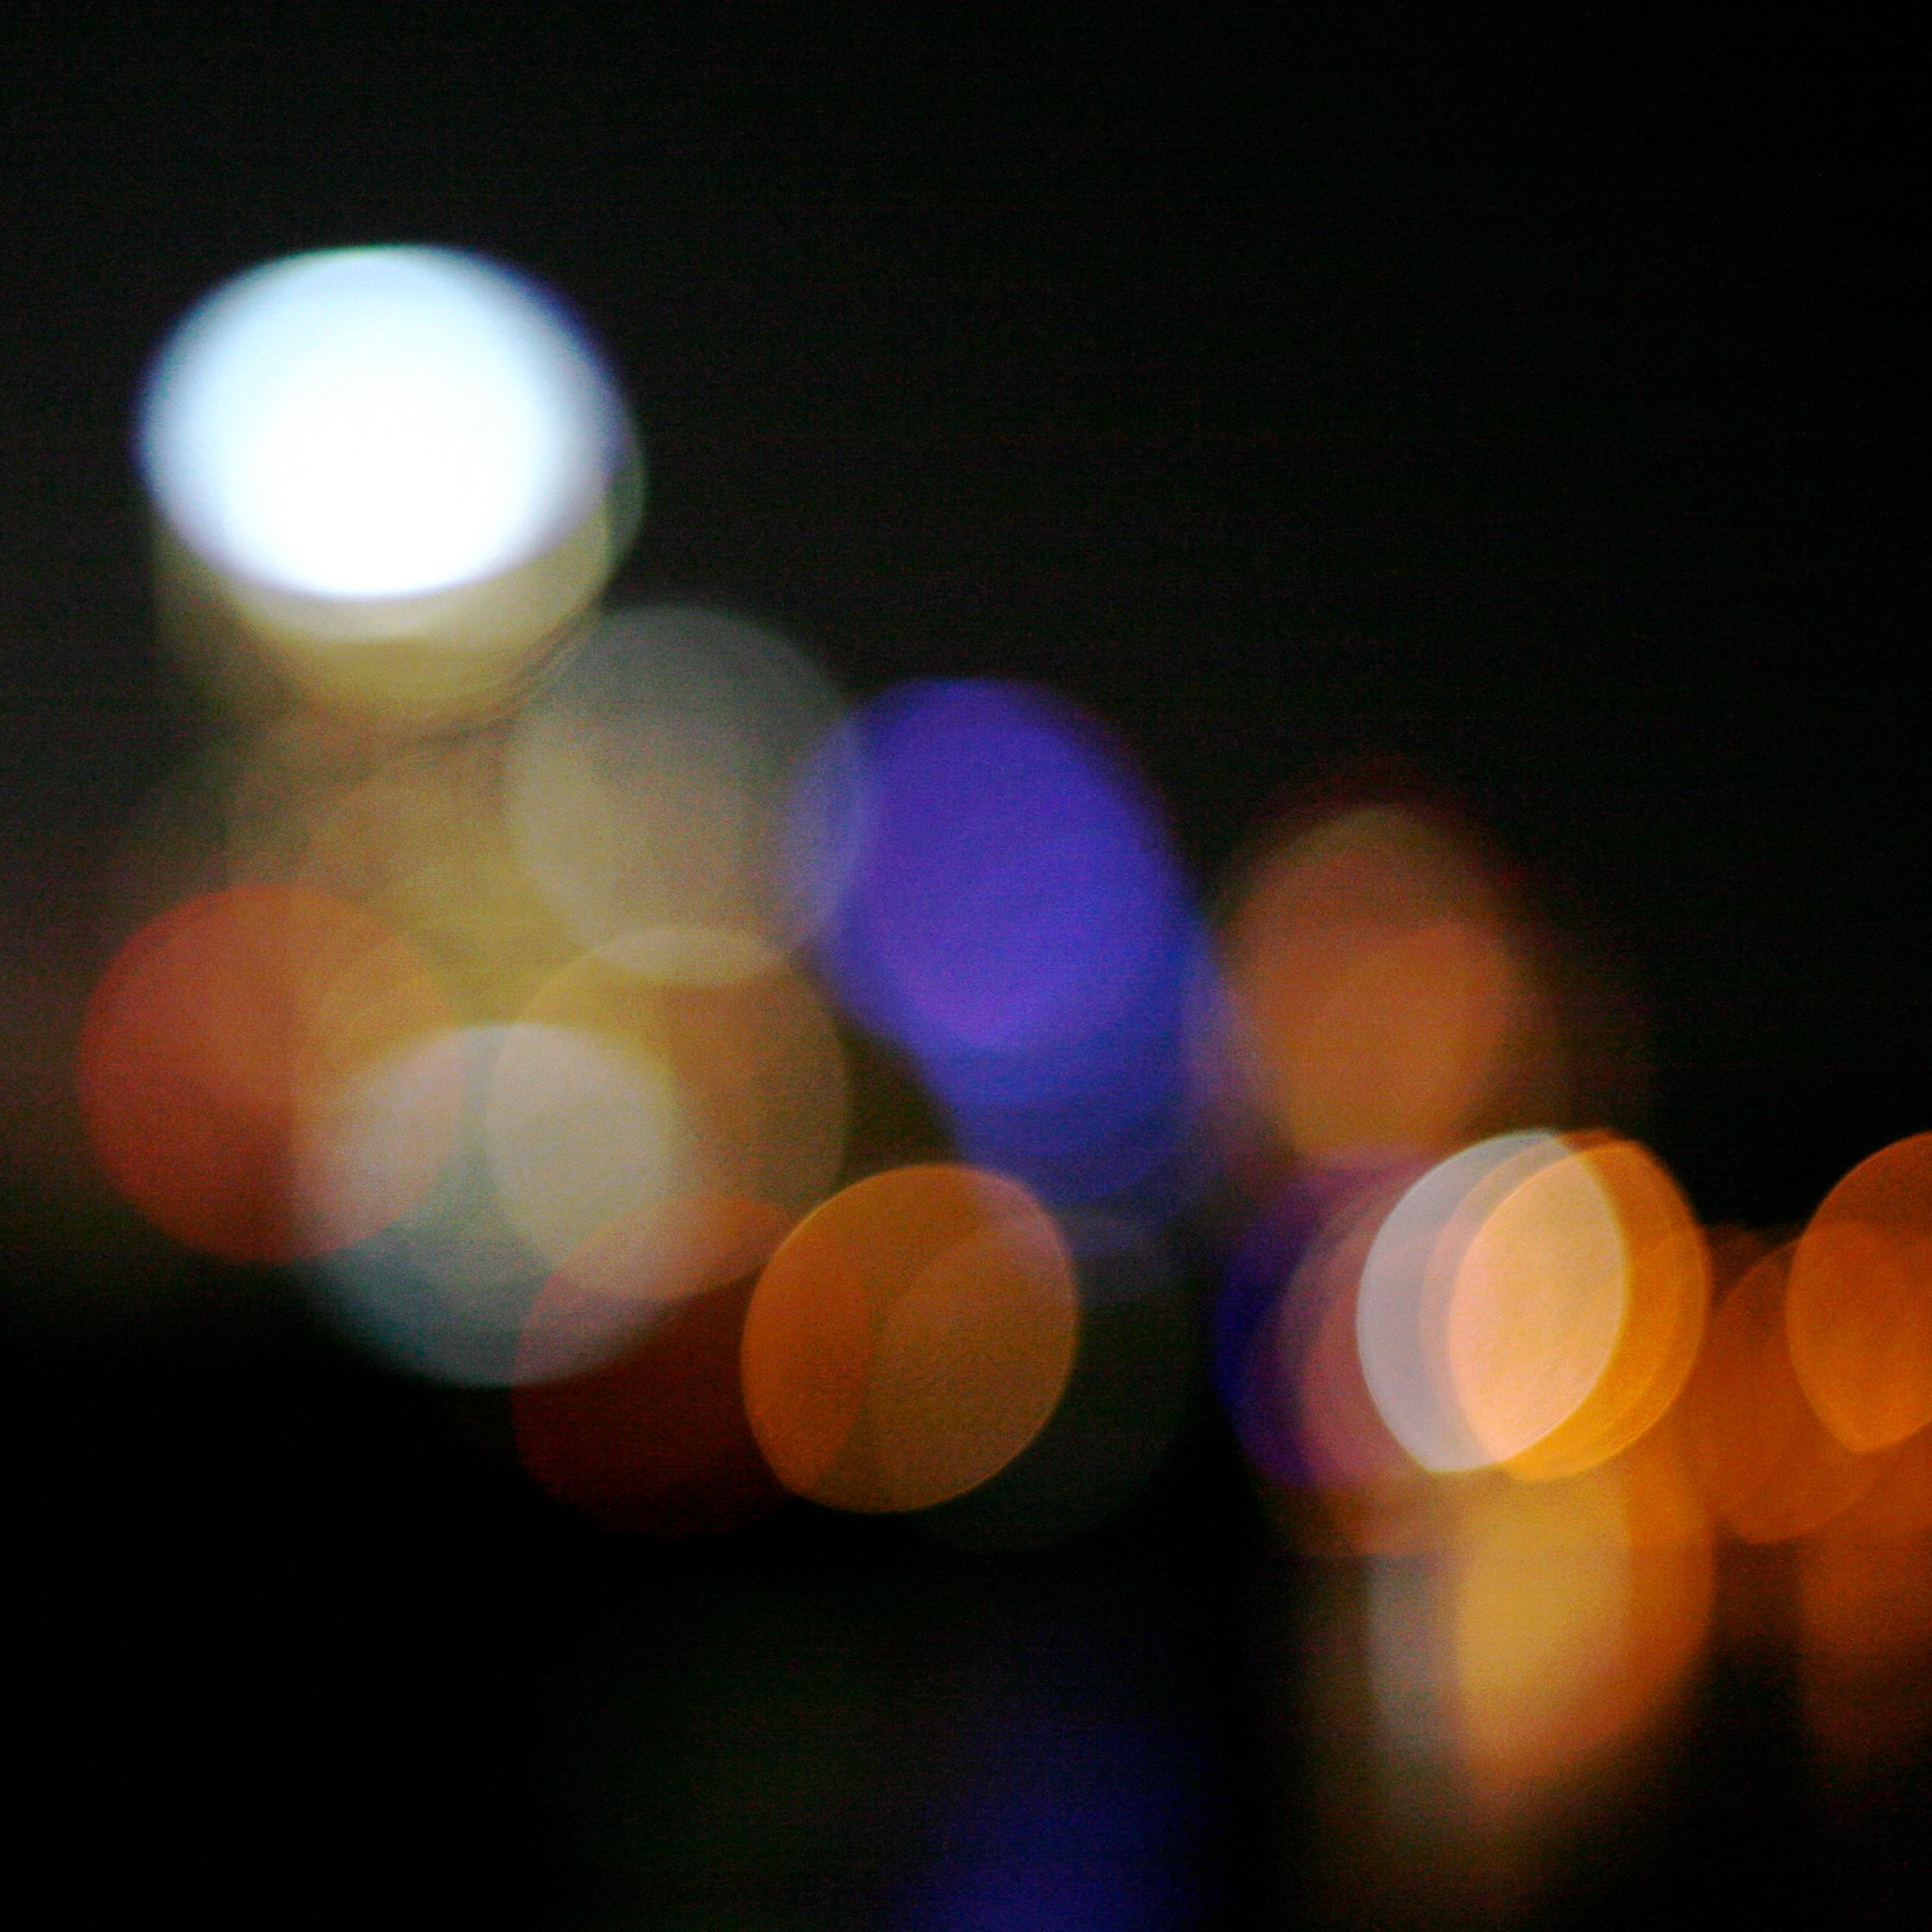 AbstractCityLights.jpg